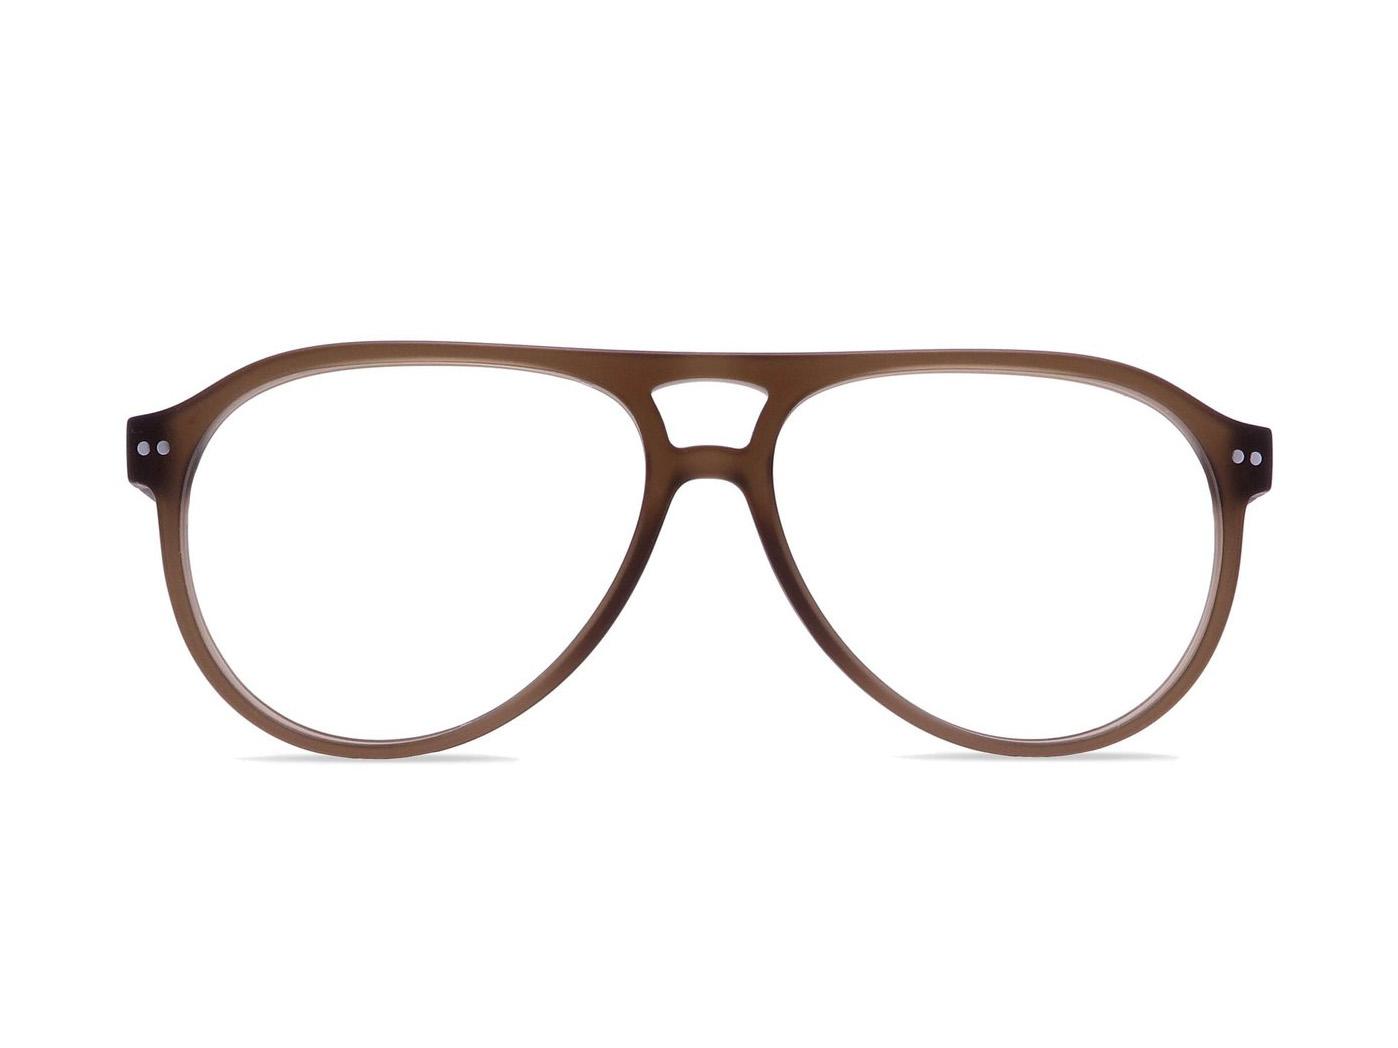 Stylish Reading Glasses - Look Optic